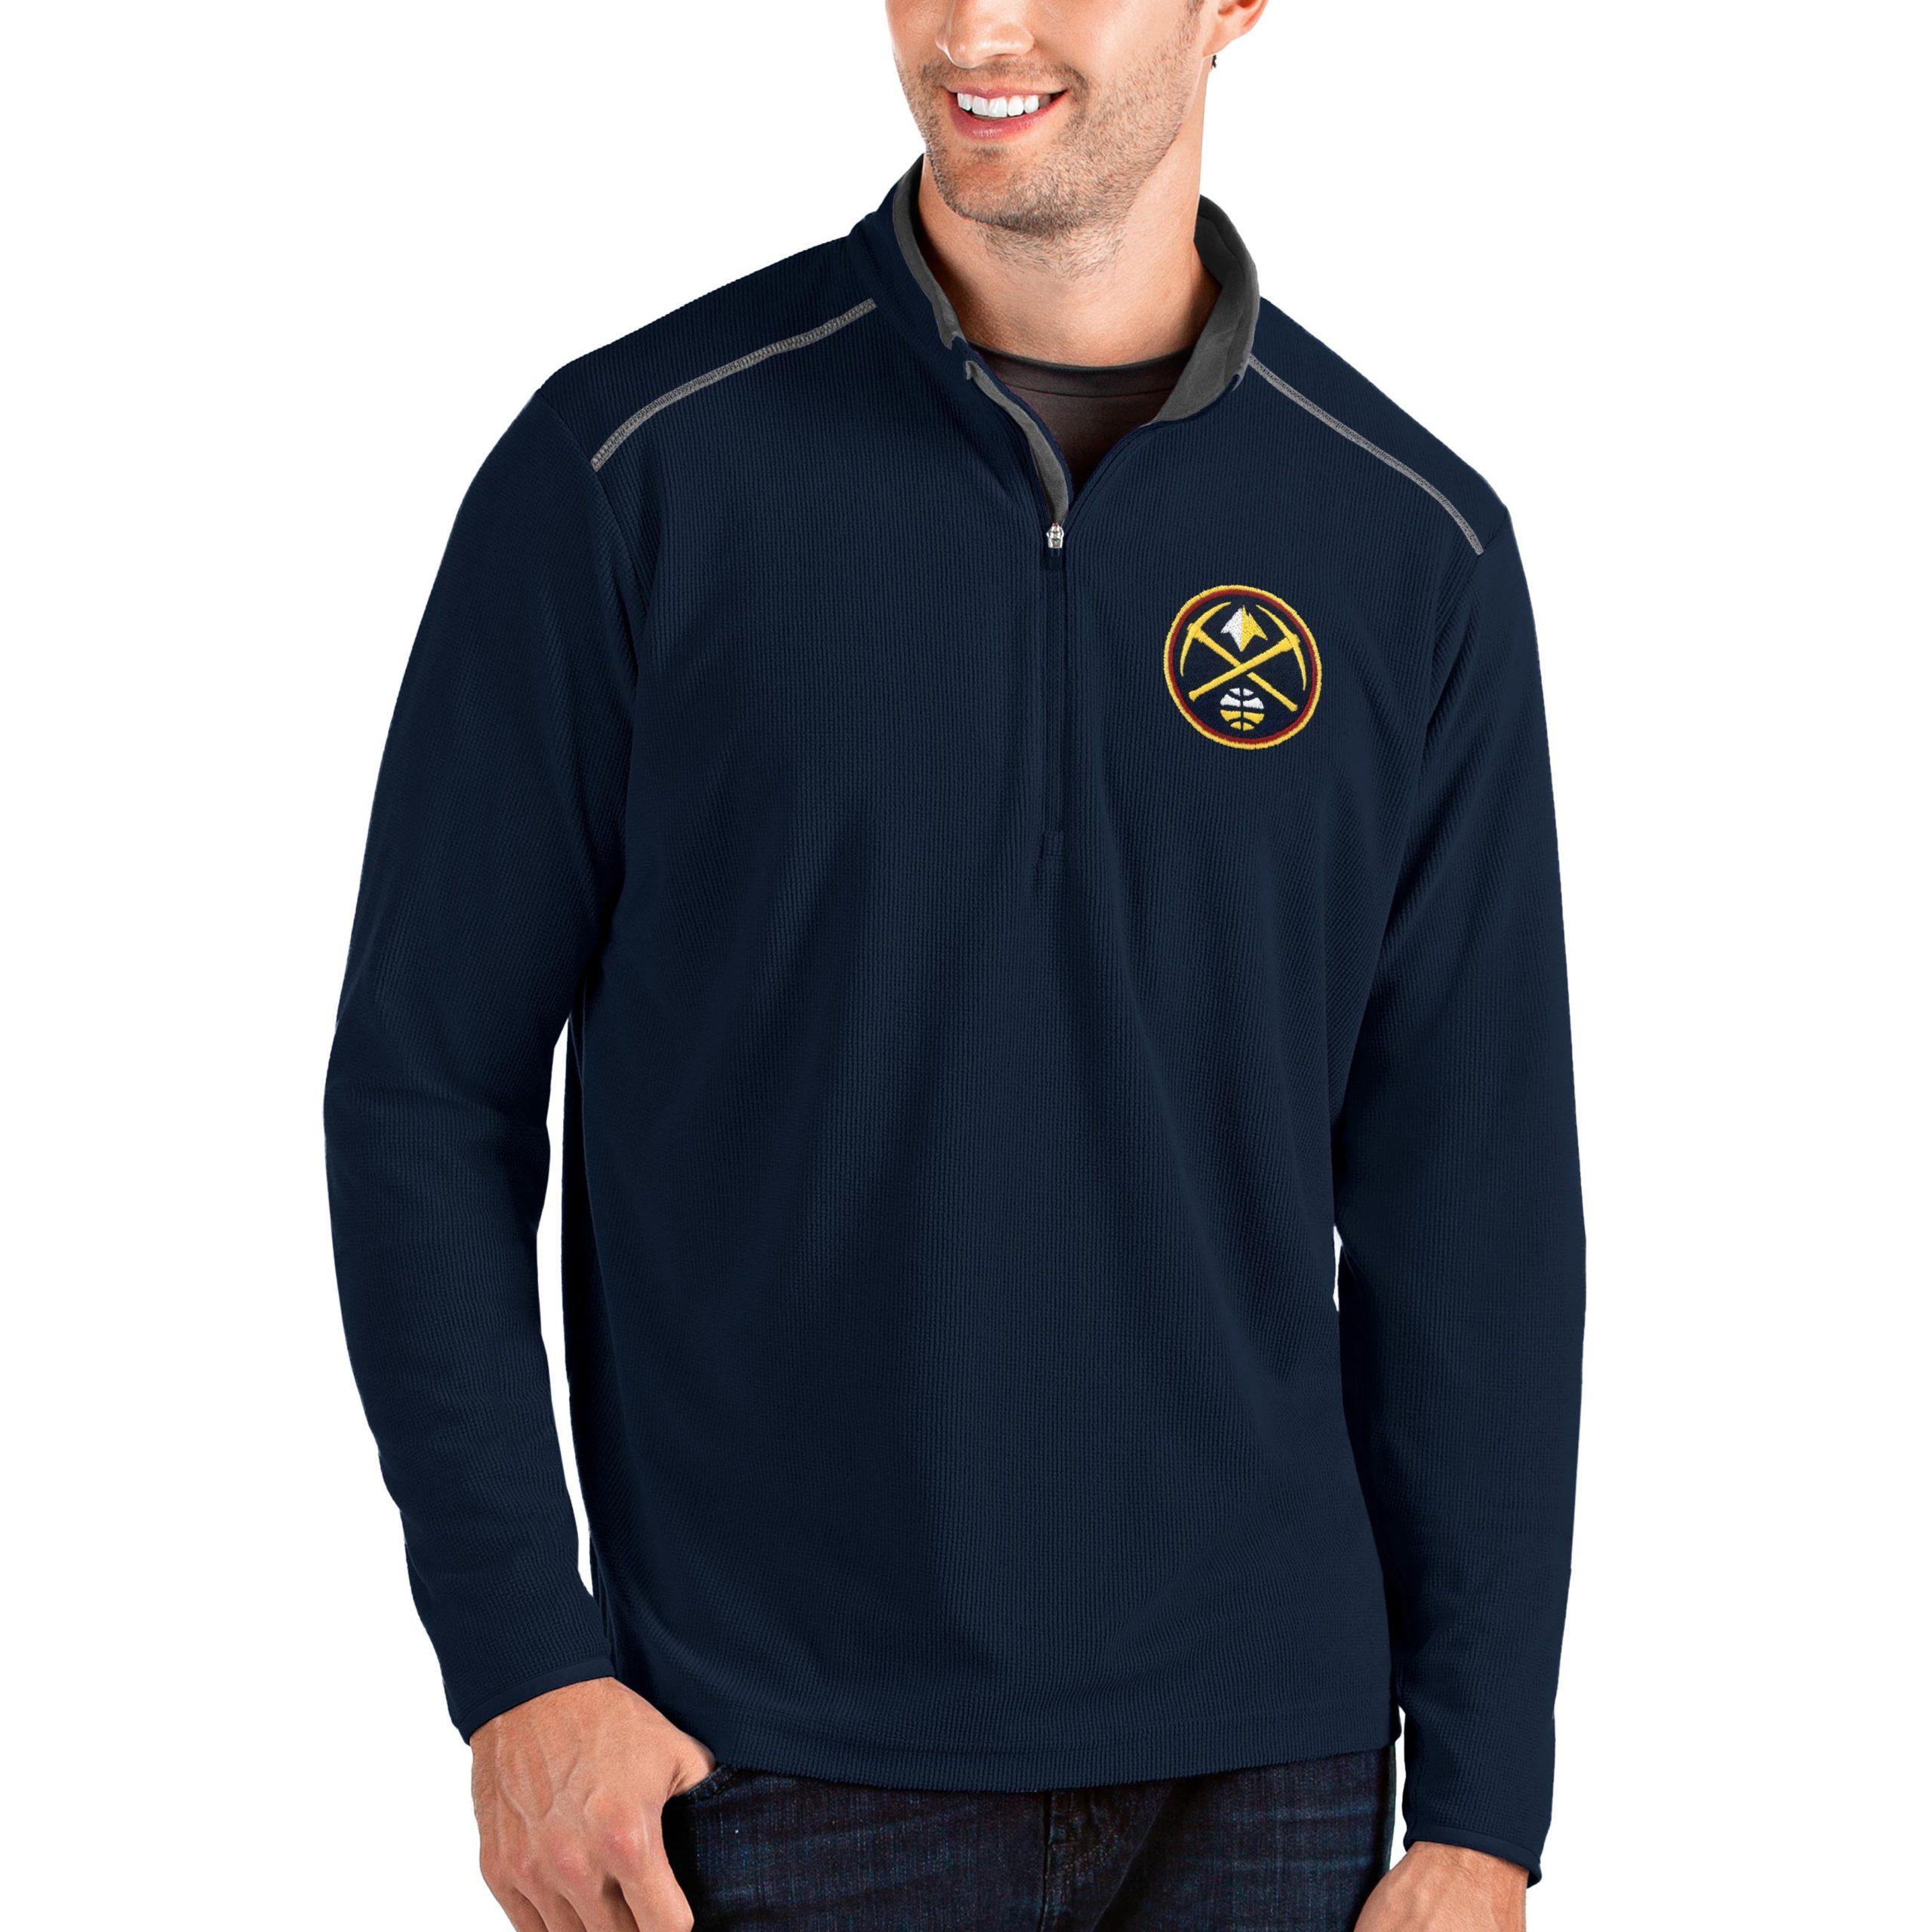 Denver Nuggets Antigua Big & Tall Glacier Quarter-Zip Pullover Jacket - Navy/Gray